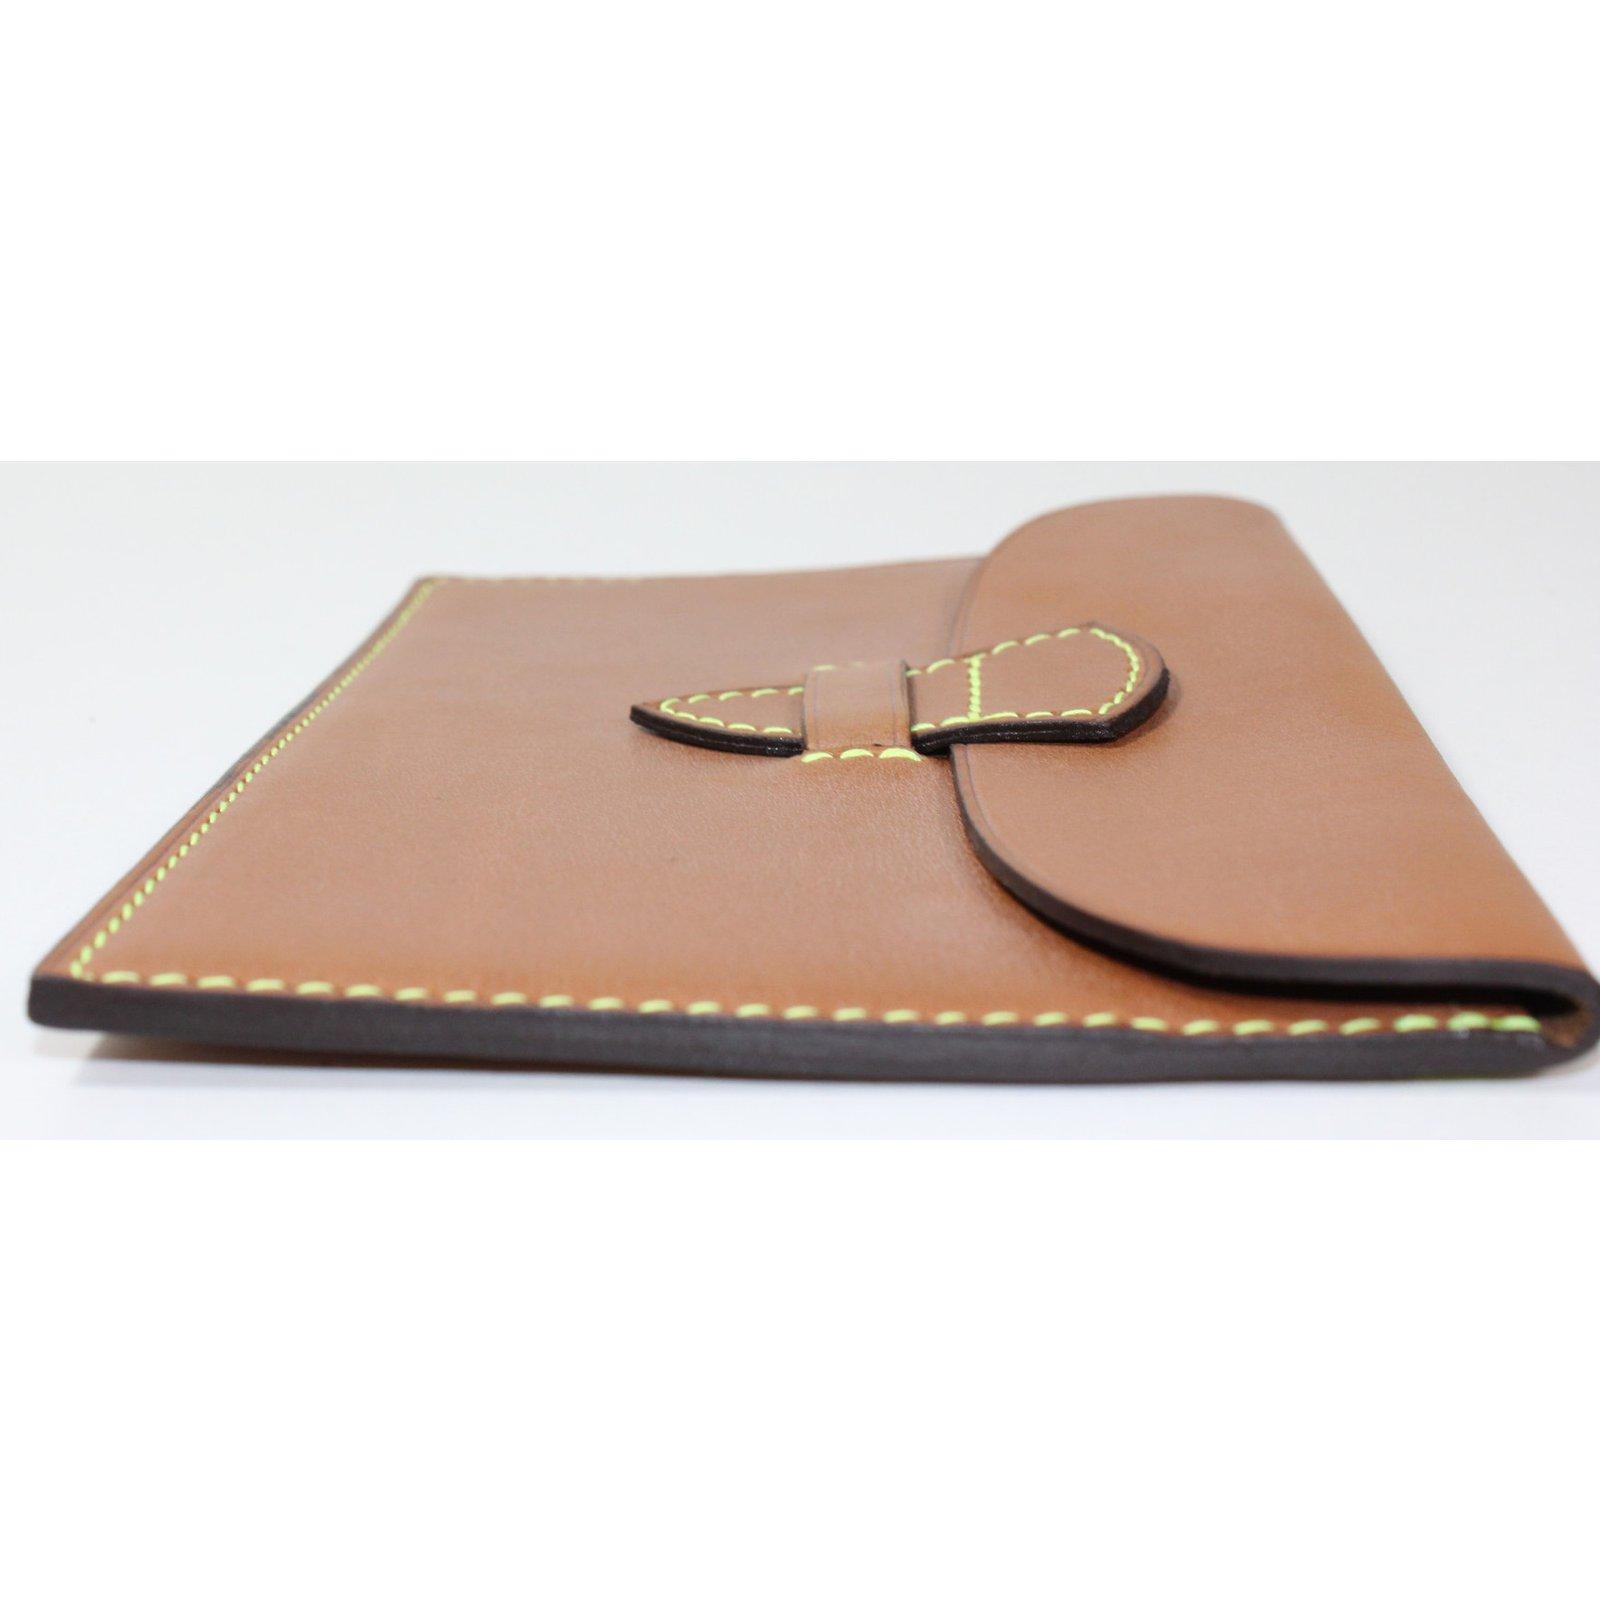 pochettes autre marque pochette maison thomas cuir caramel joli closet. Black Bedroom Furniture Sets. Home Design Ideas